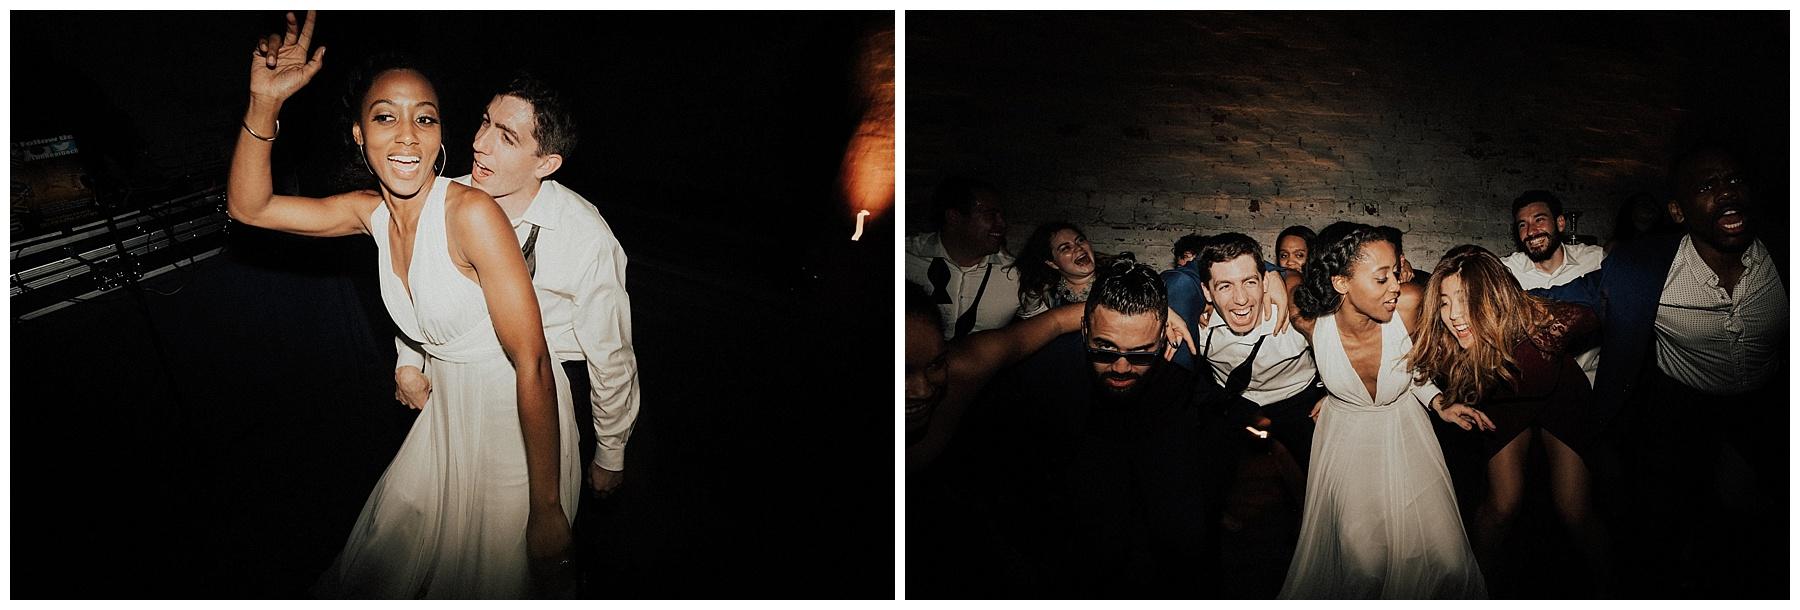 Rialto Theatre Tampa Wedding Photographer-150.jpg